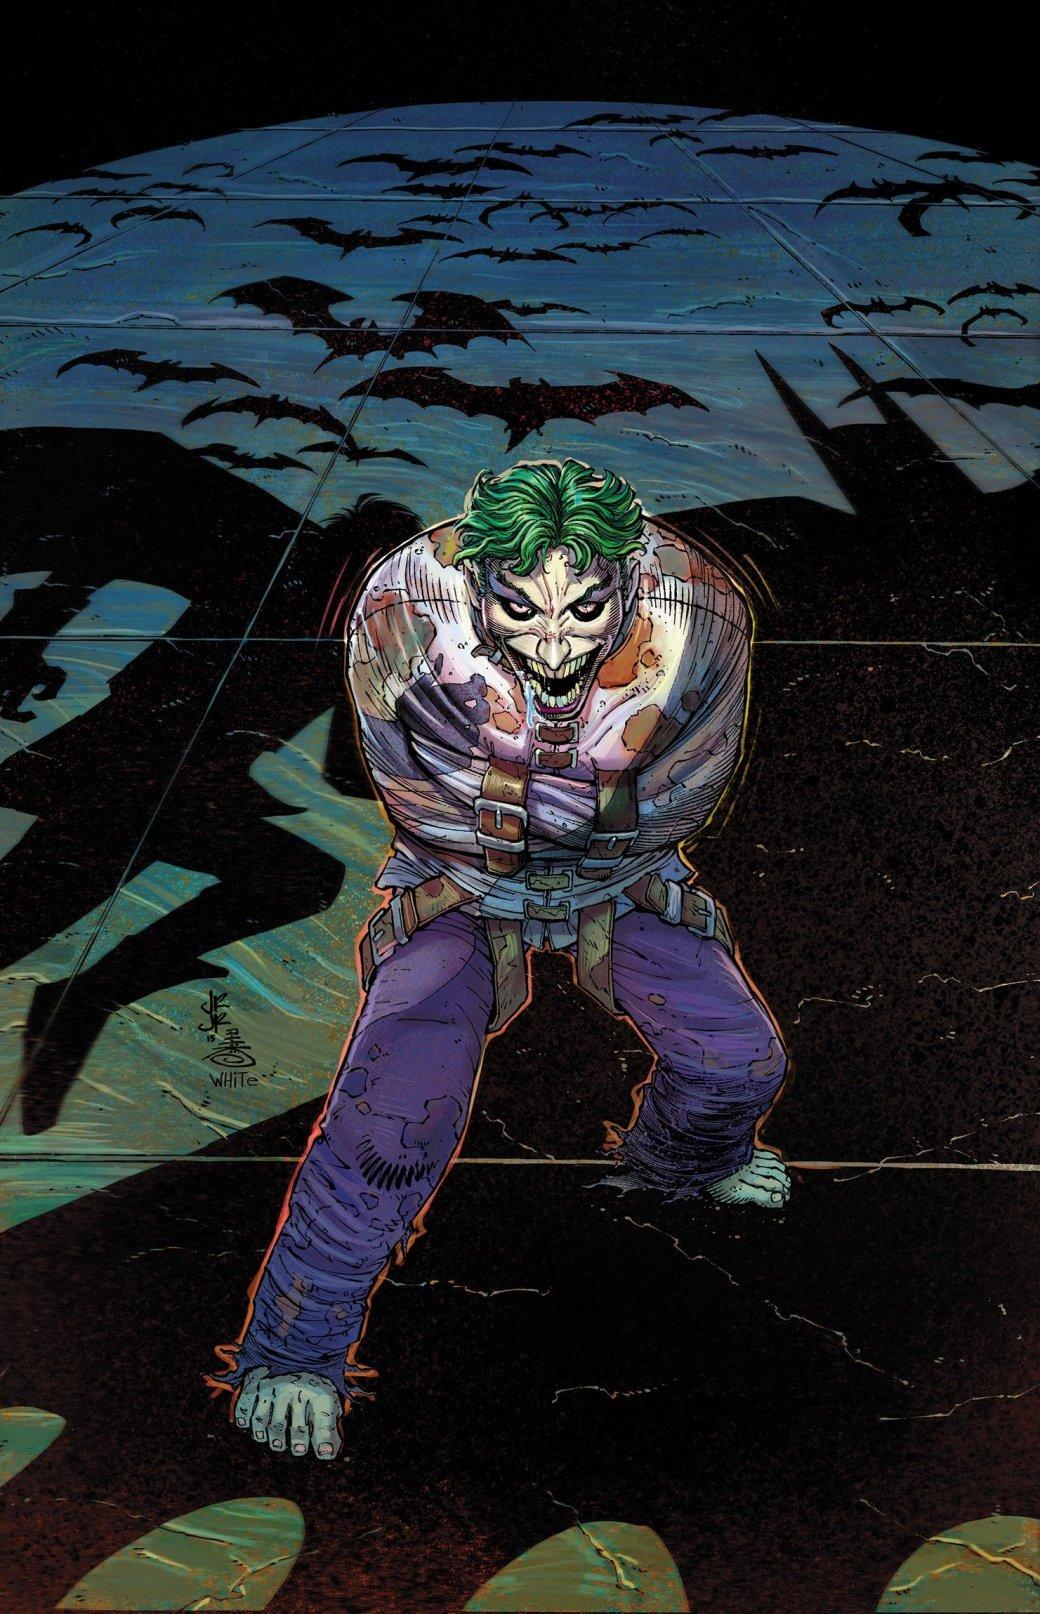 The Dark Knight: что нетак скомиксами Фрэнка Миллера про Бэтмена? | Канобу - Изображение 6